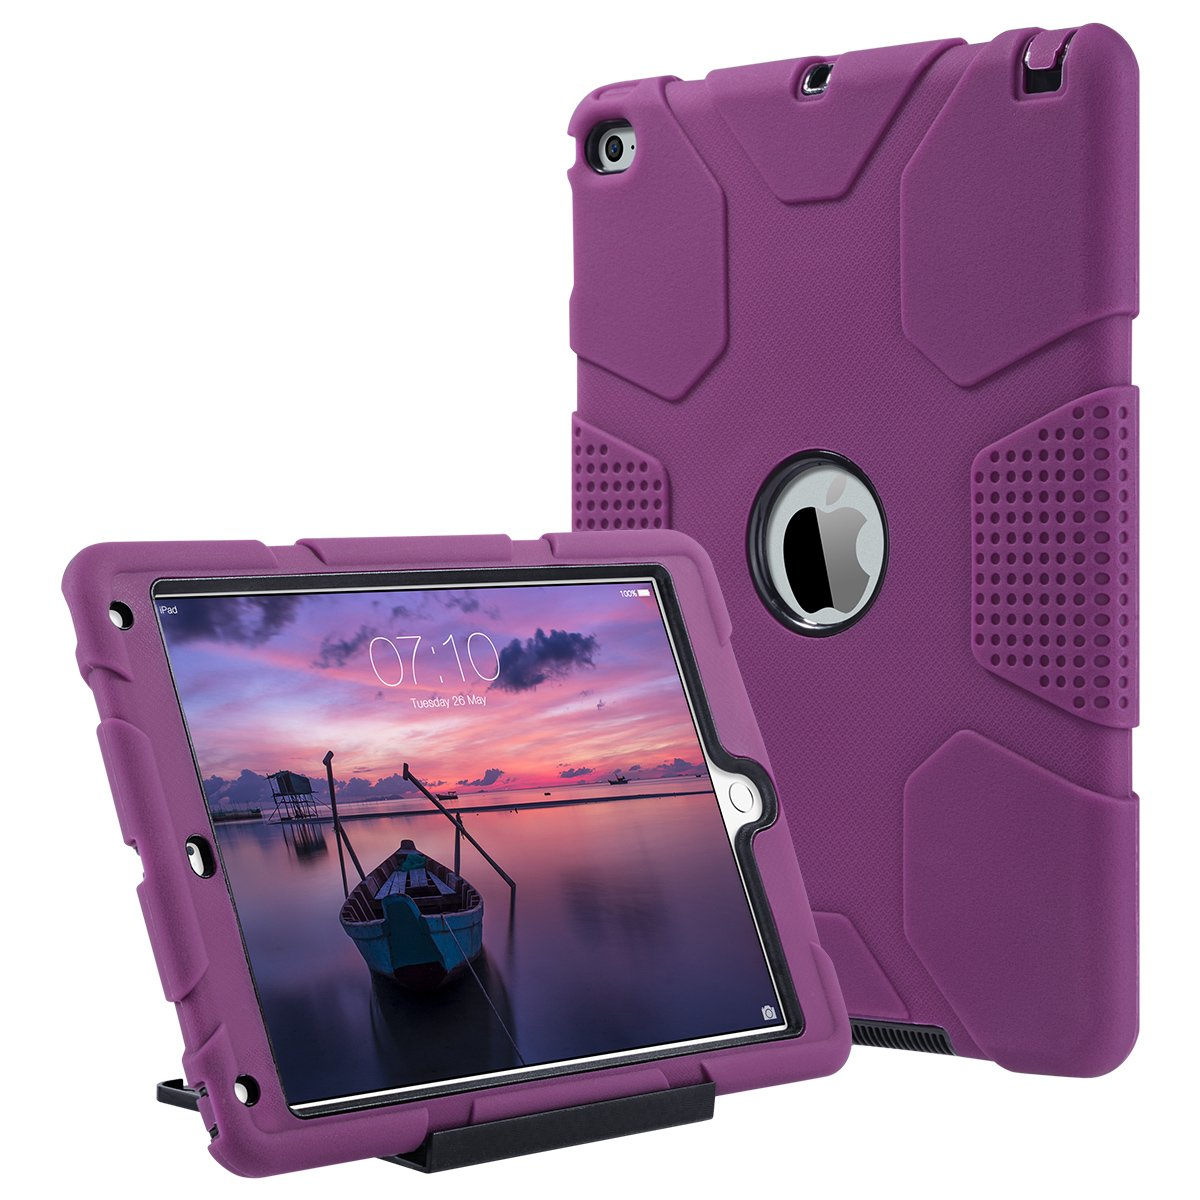 ULAK iPad Air 2 Case, Heavy Duty Apple iPad Air 2 Shockproof Rugged Protective Case with Separate Kickstand for Apple iPad Air 2 (2014 Release) - Deep Fuchsia/Black